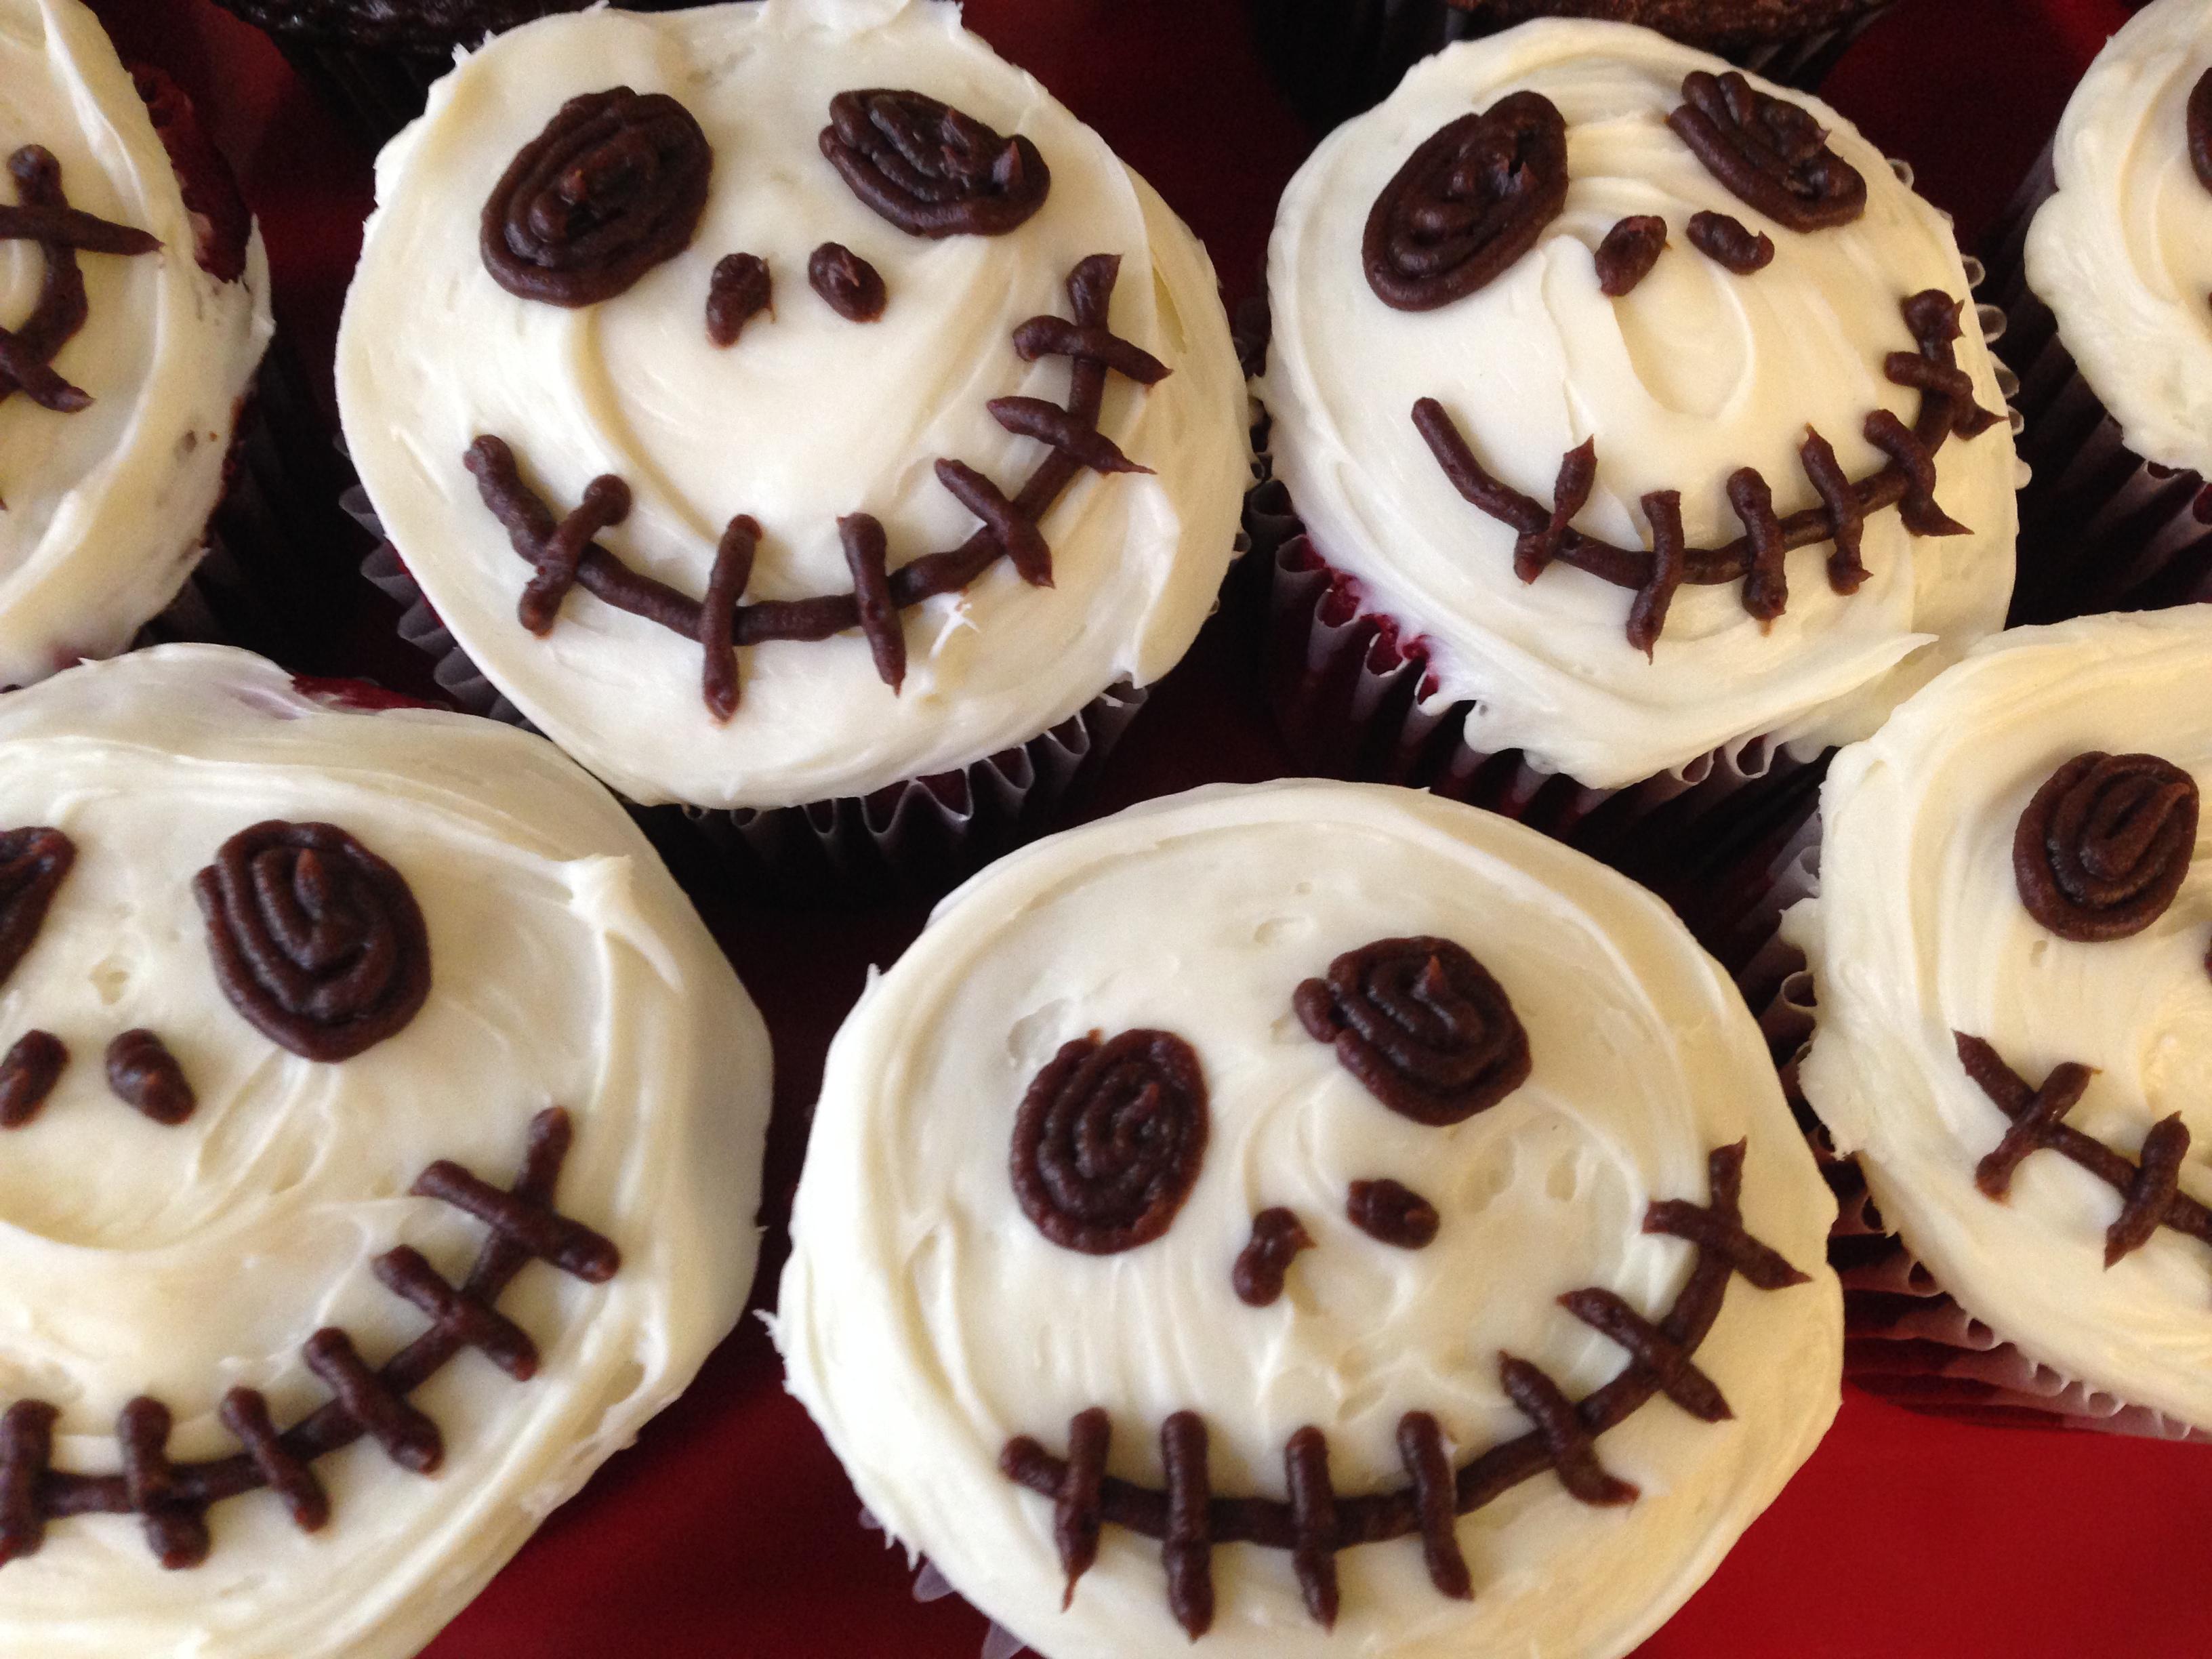 Creepy Halloween Skull Cupcakes